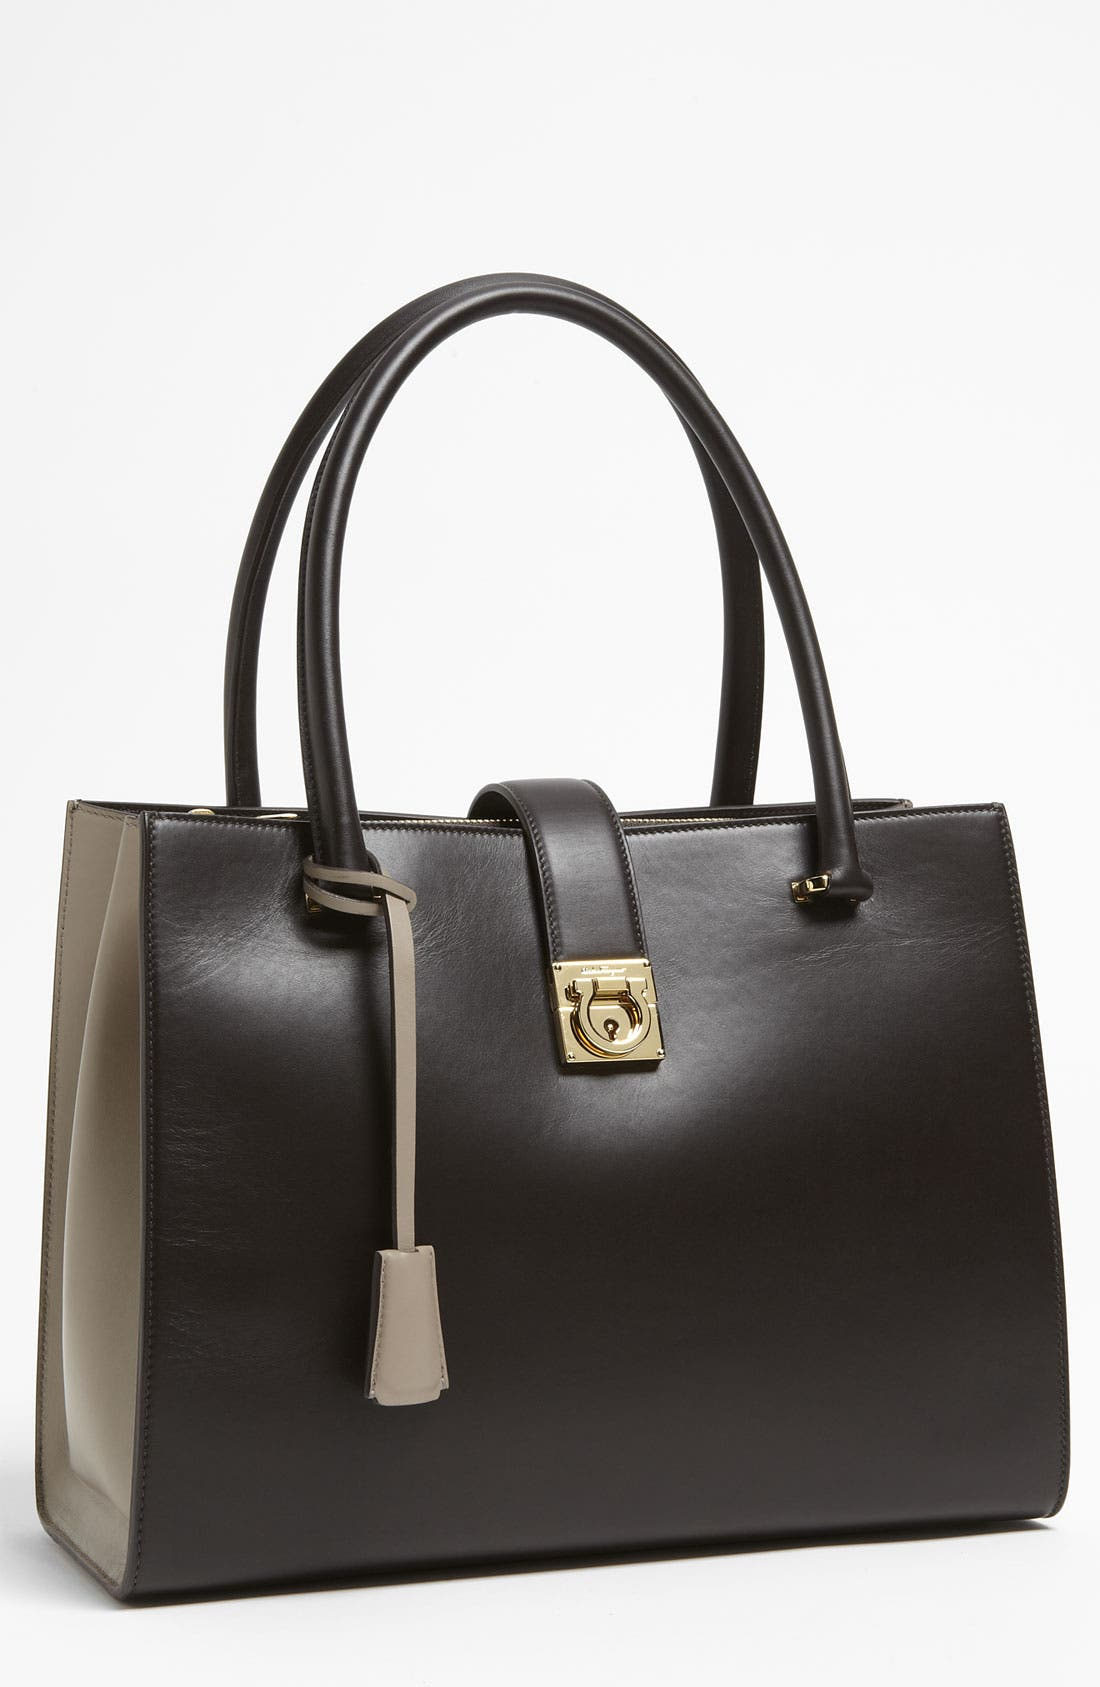 6da6a5a2e9 Salvatore Ferragamo Handbags for Women